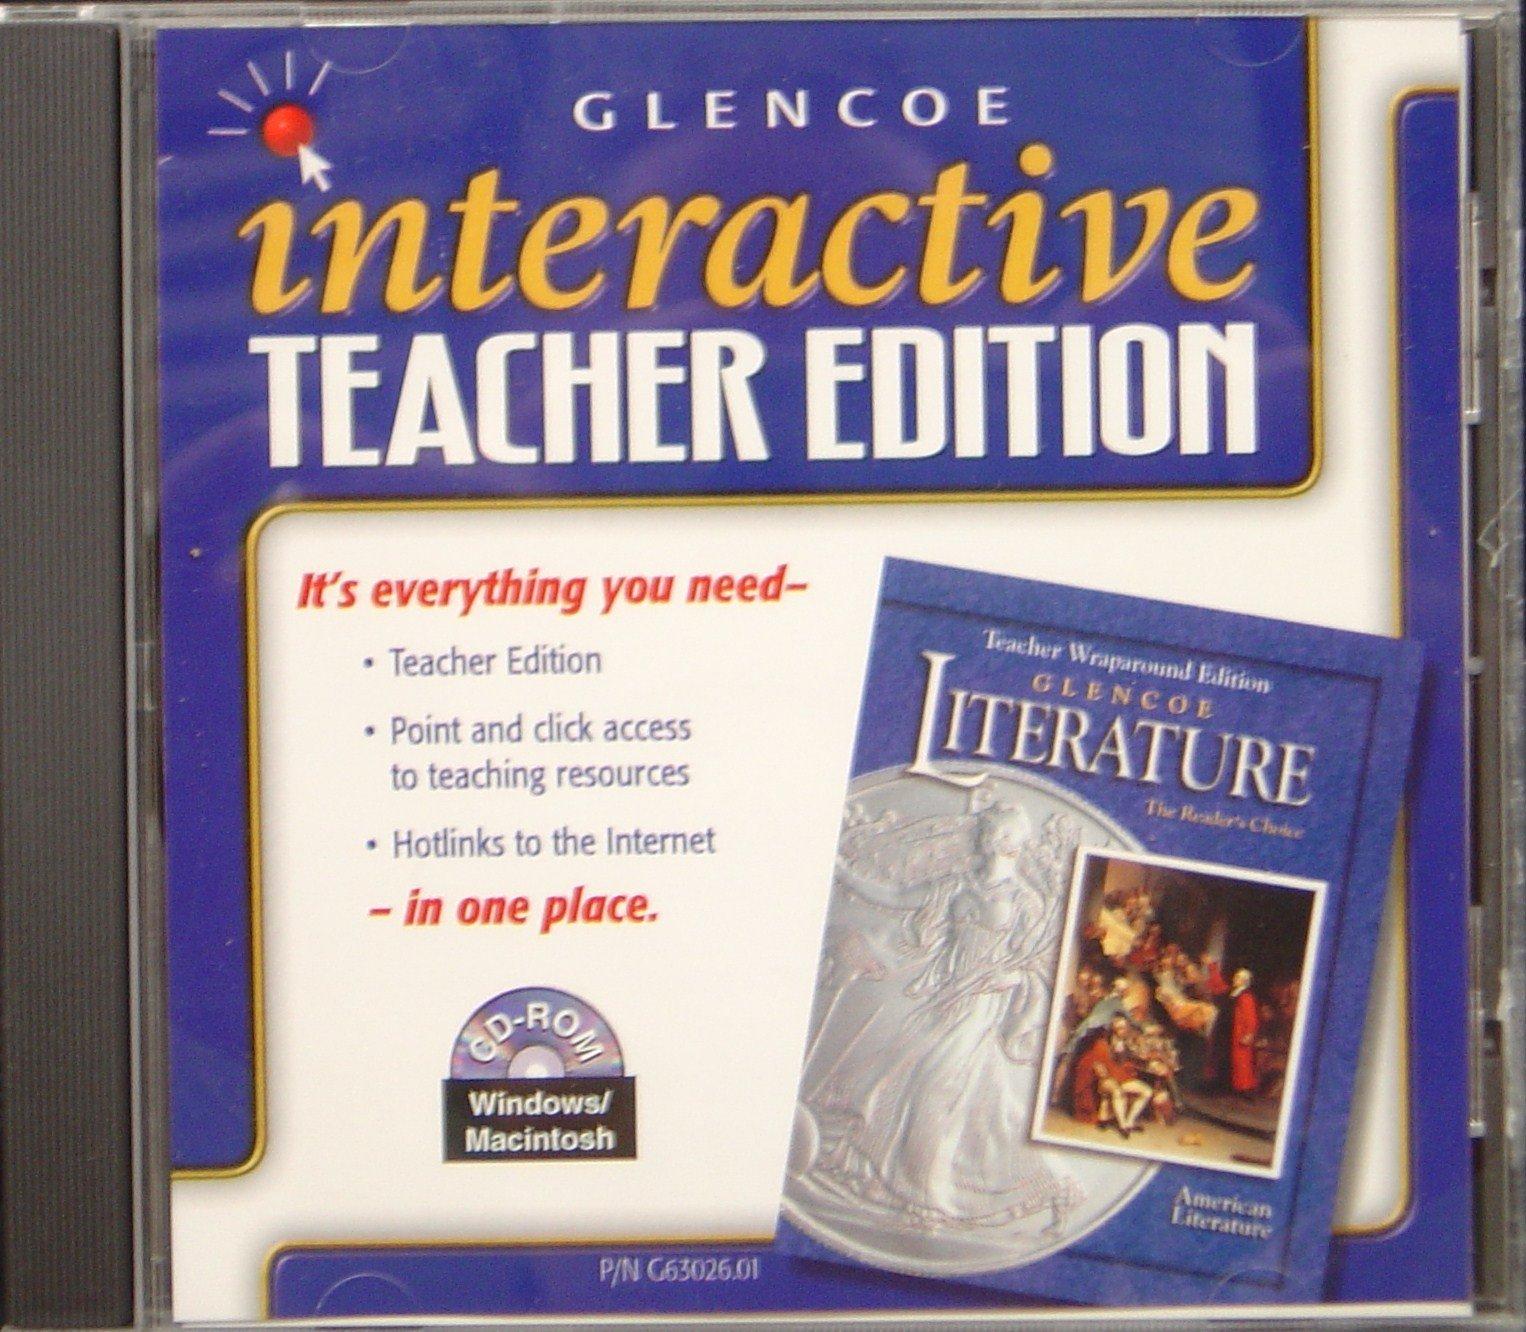 Interactive Teacher Edition CD for TWE Glencoe Literature (The Reader's Choice: American Literature, 0078263026) pdf